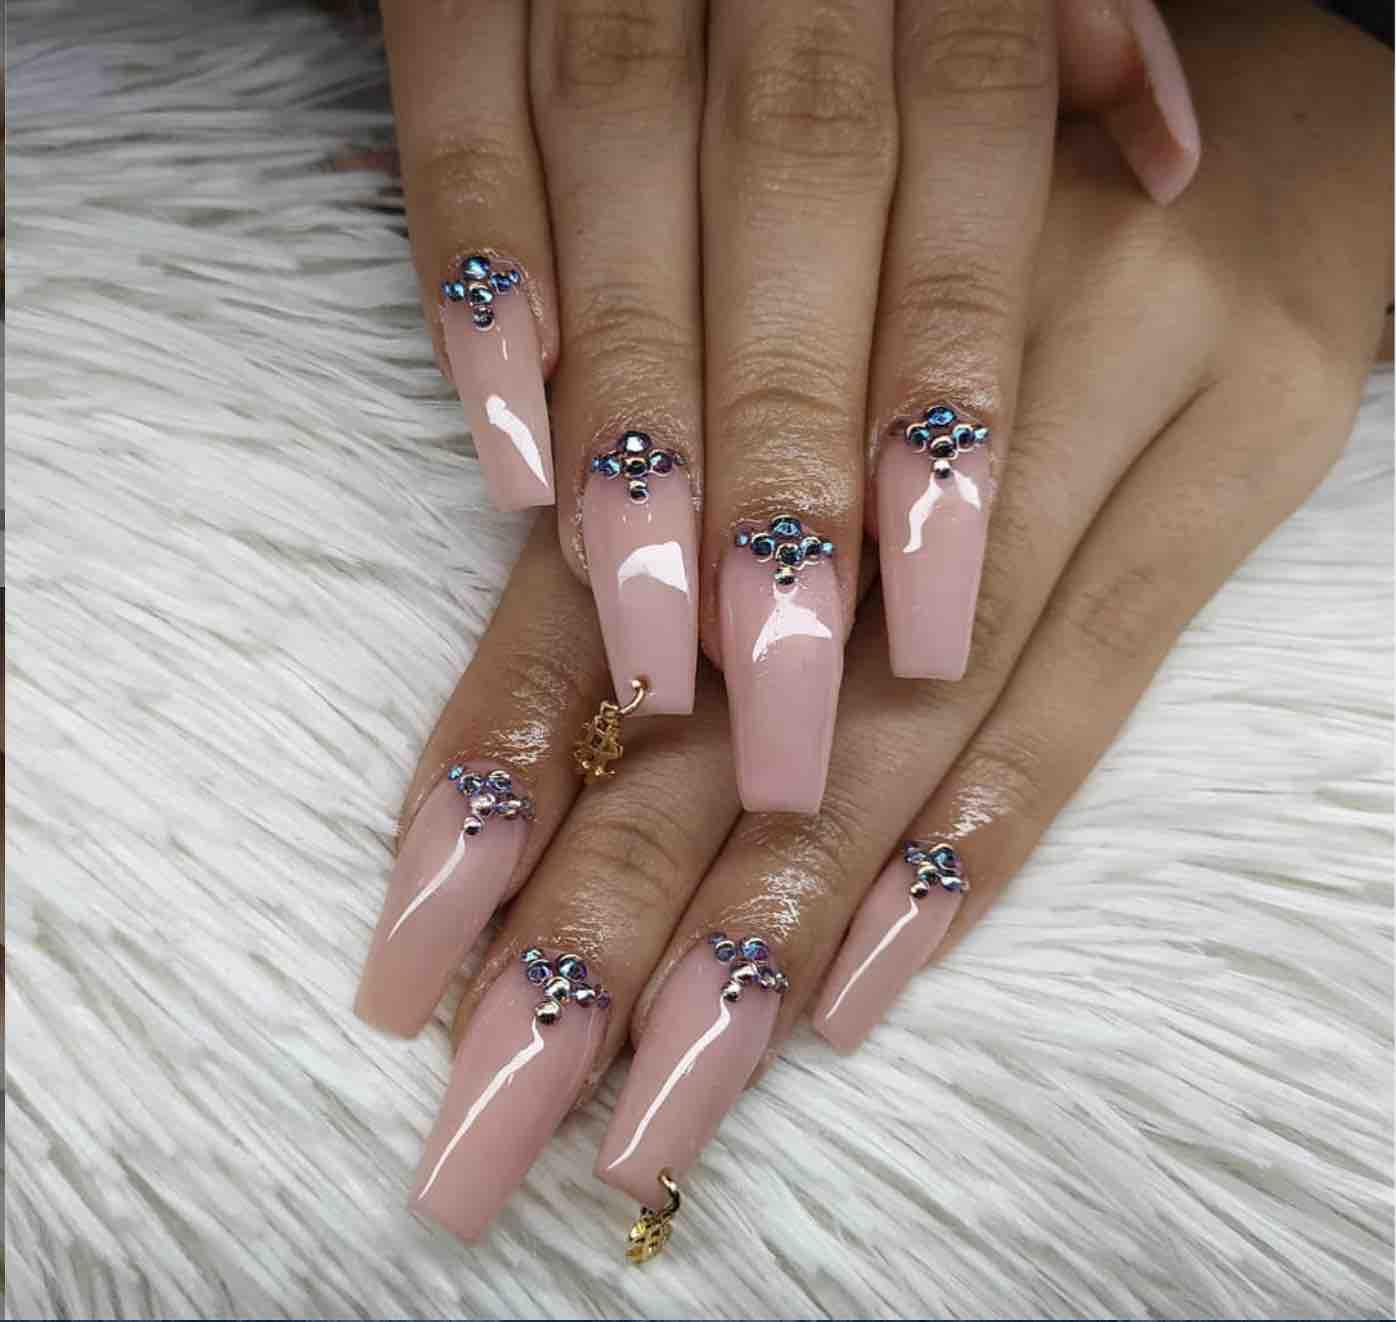 piercing nails